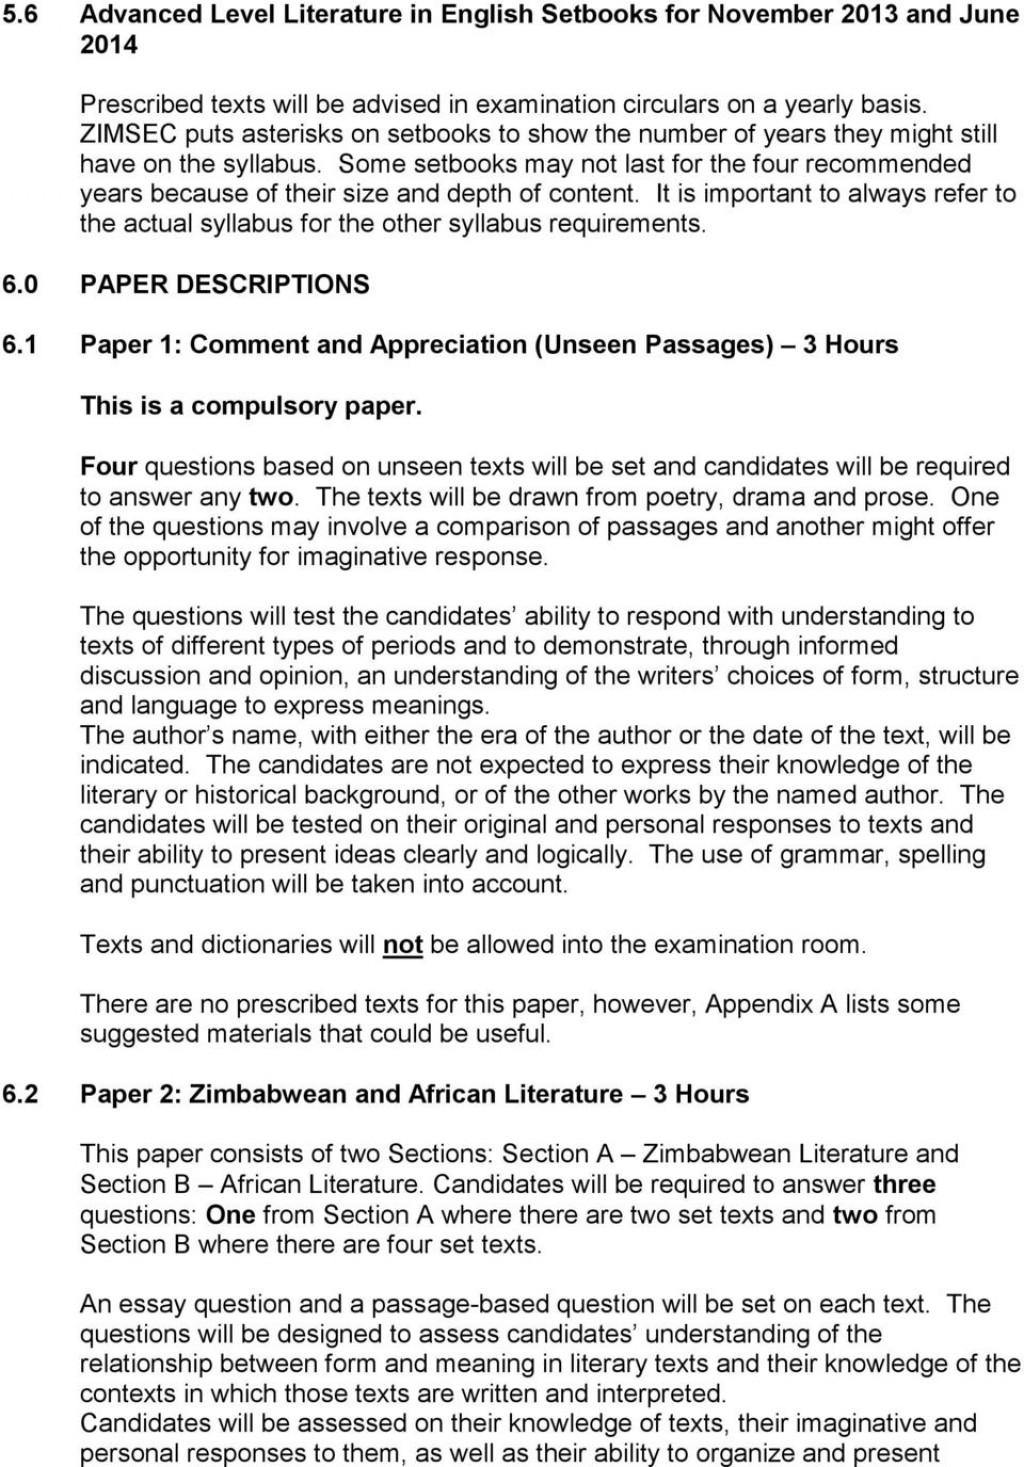 002 Concussion Essay Argumentative Research Paper Thesis Concussions Topics P Beautiful Outline Examples Conclusion Large